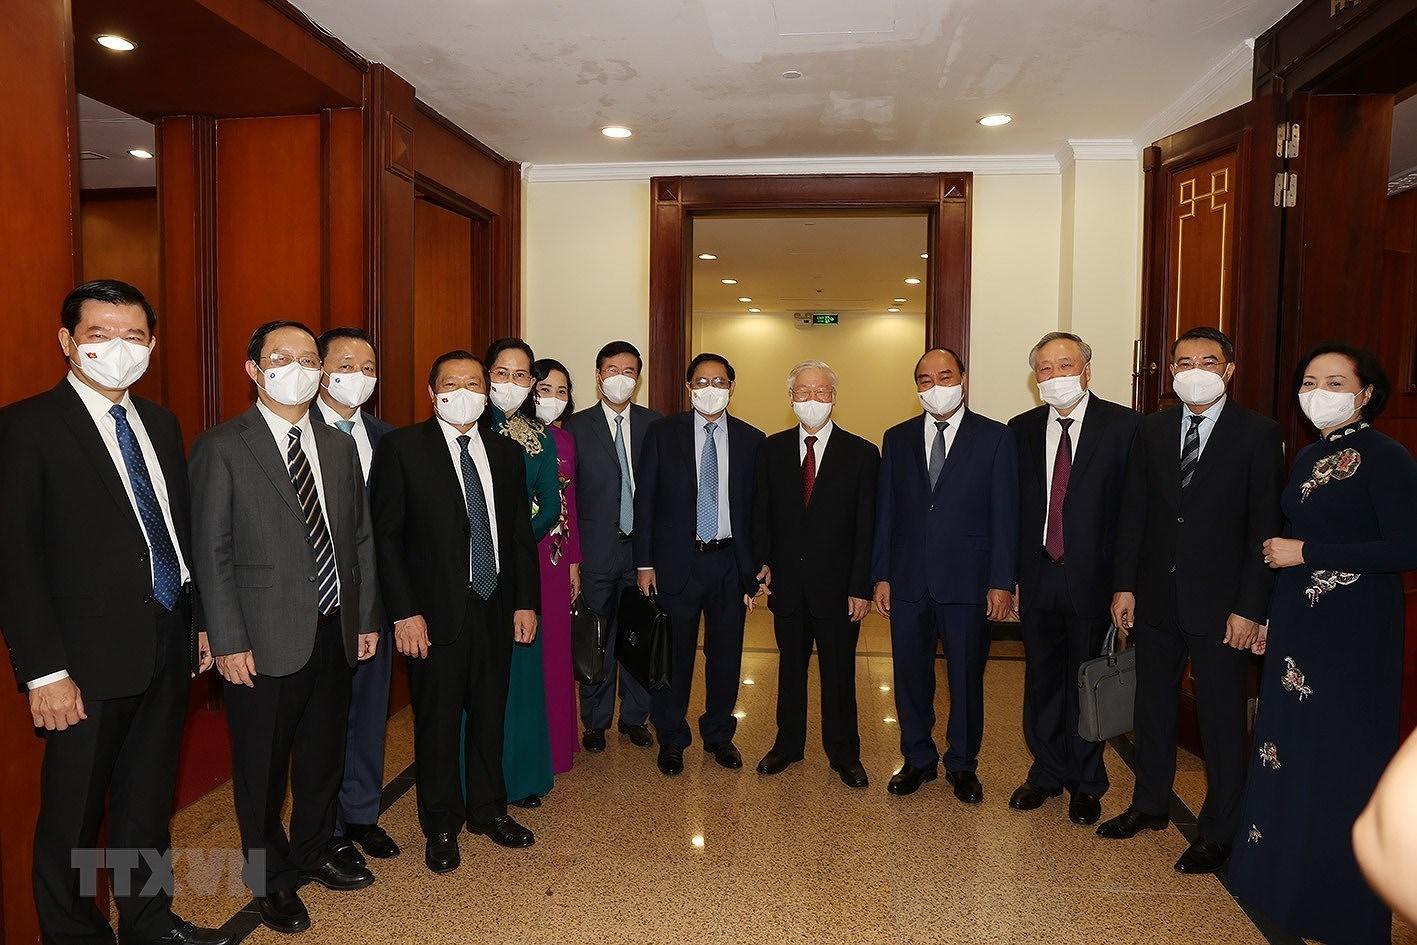 [Photo] Hoi nghi lan thu tu Ban Chap hanh Trung uong Dang khoa XIII hinh anh 7